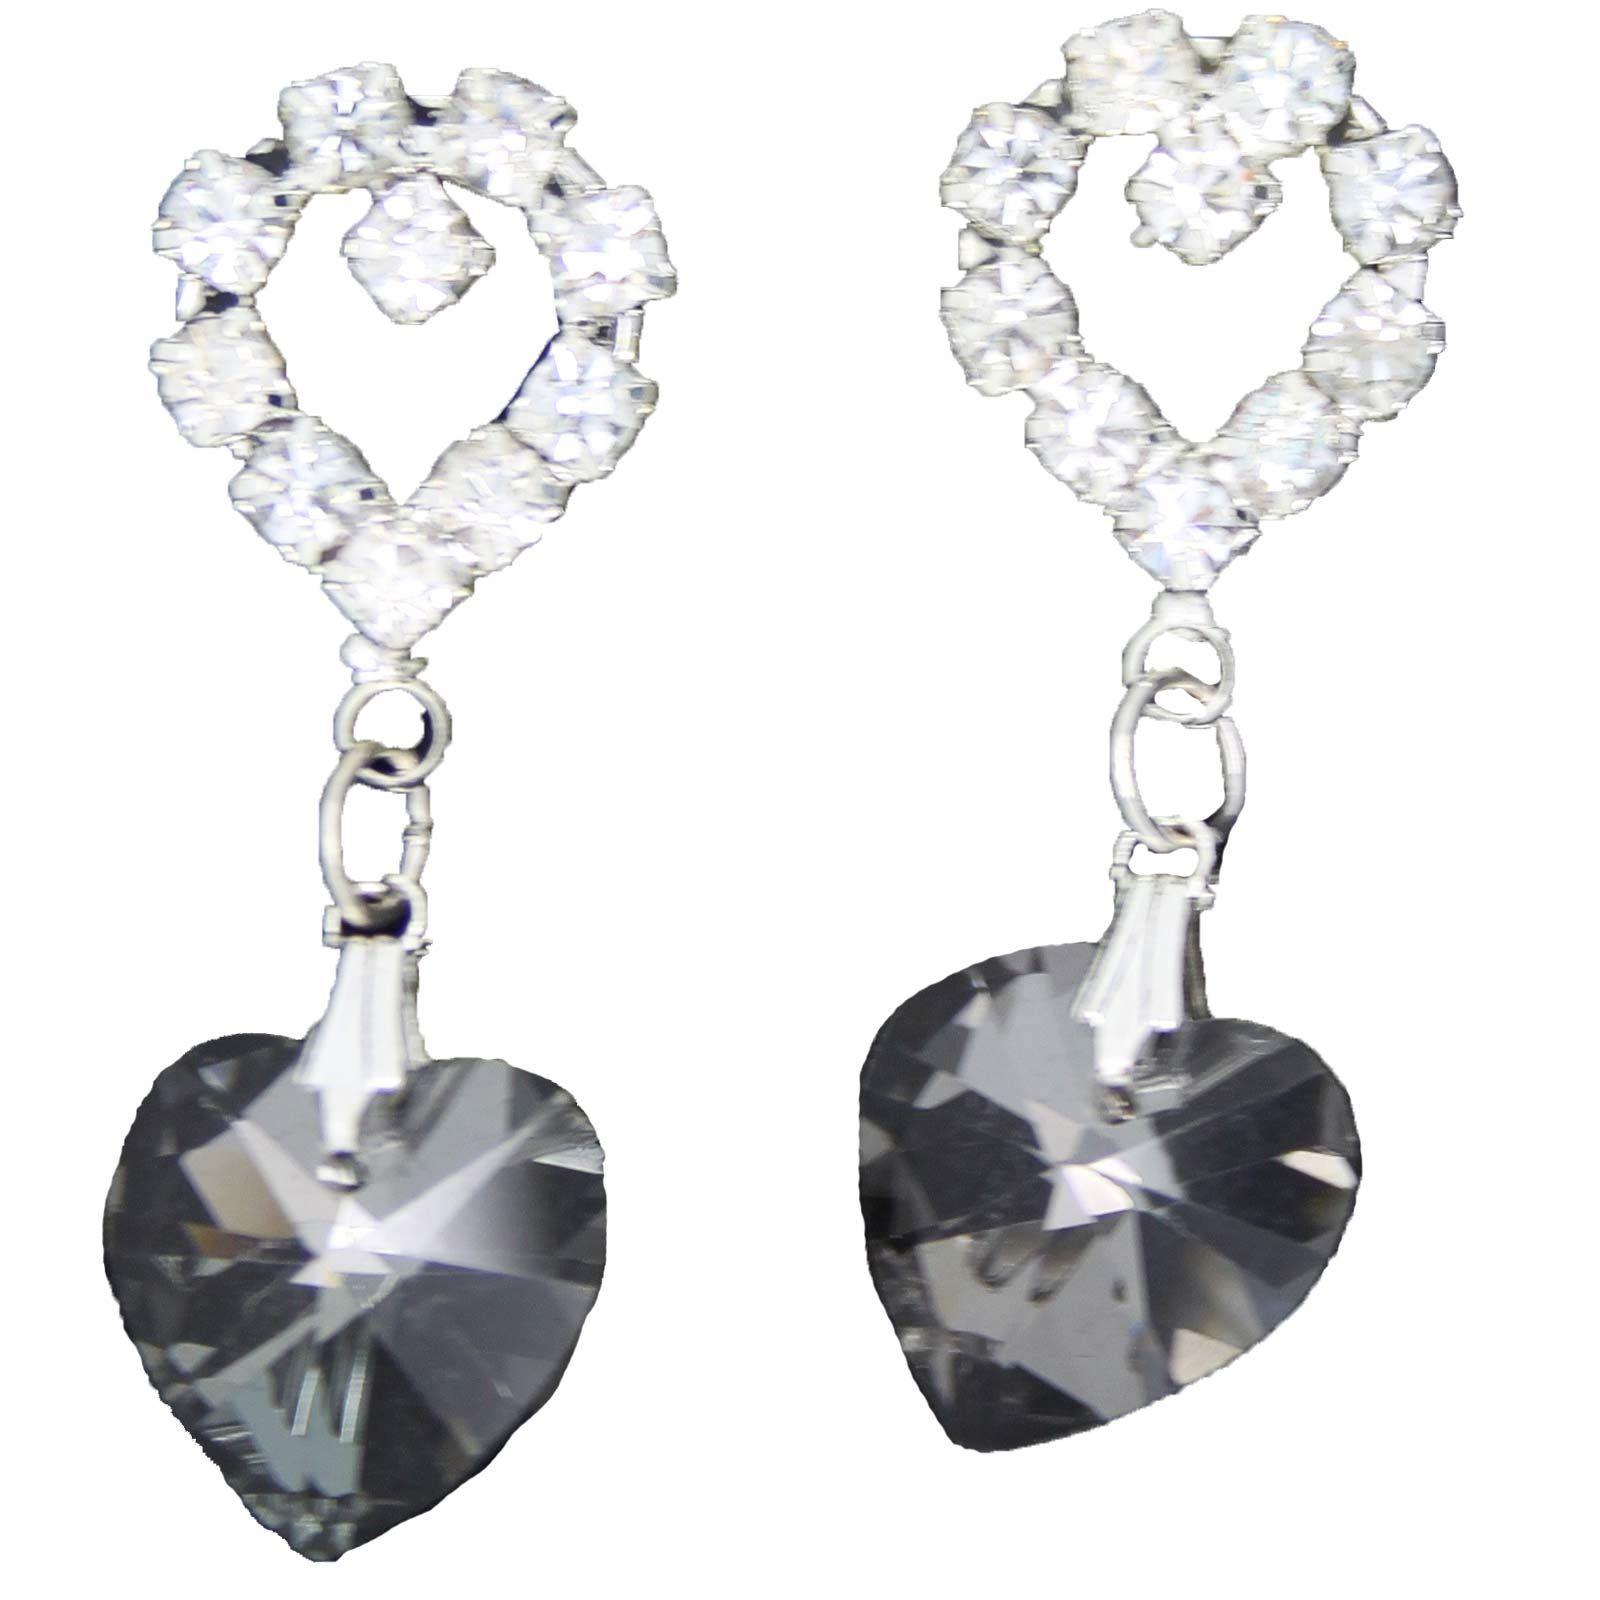 True-Face-Ladies-Women-039-s-Elegant-Earrings-Necklace-Set-Metal-Alloy-Jewellery thumbnail 21